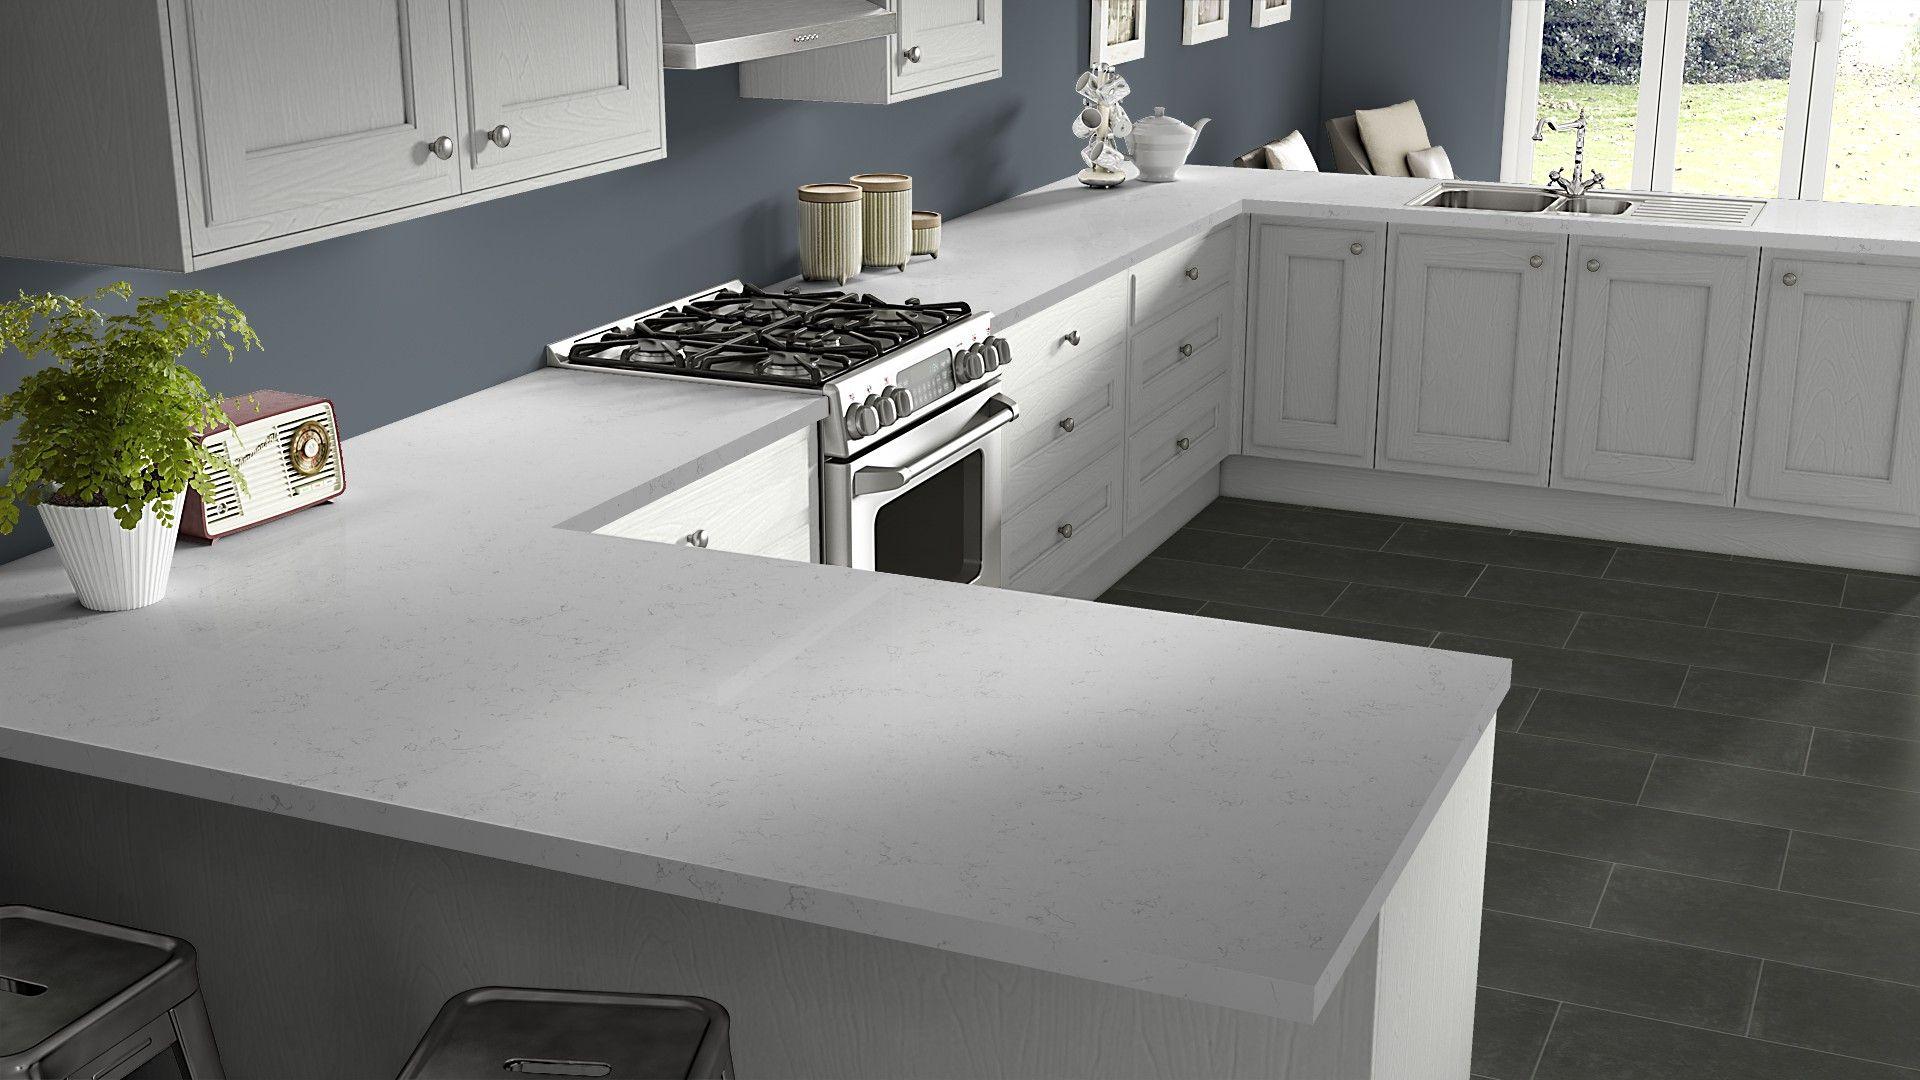 HAIDA QUARTZ. Get inspired for your kitchen renovation